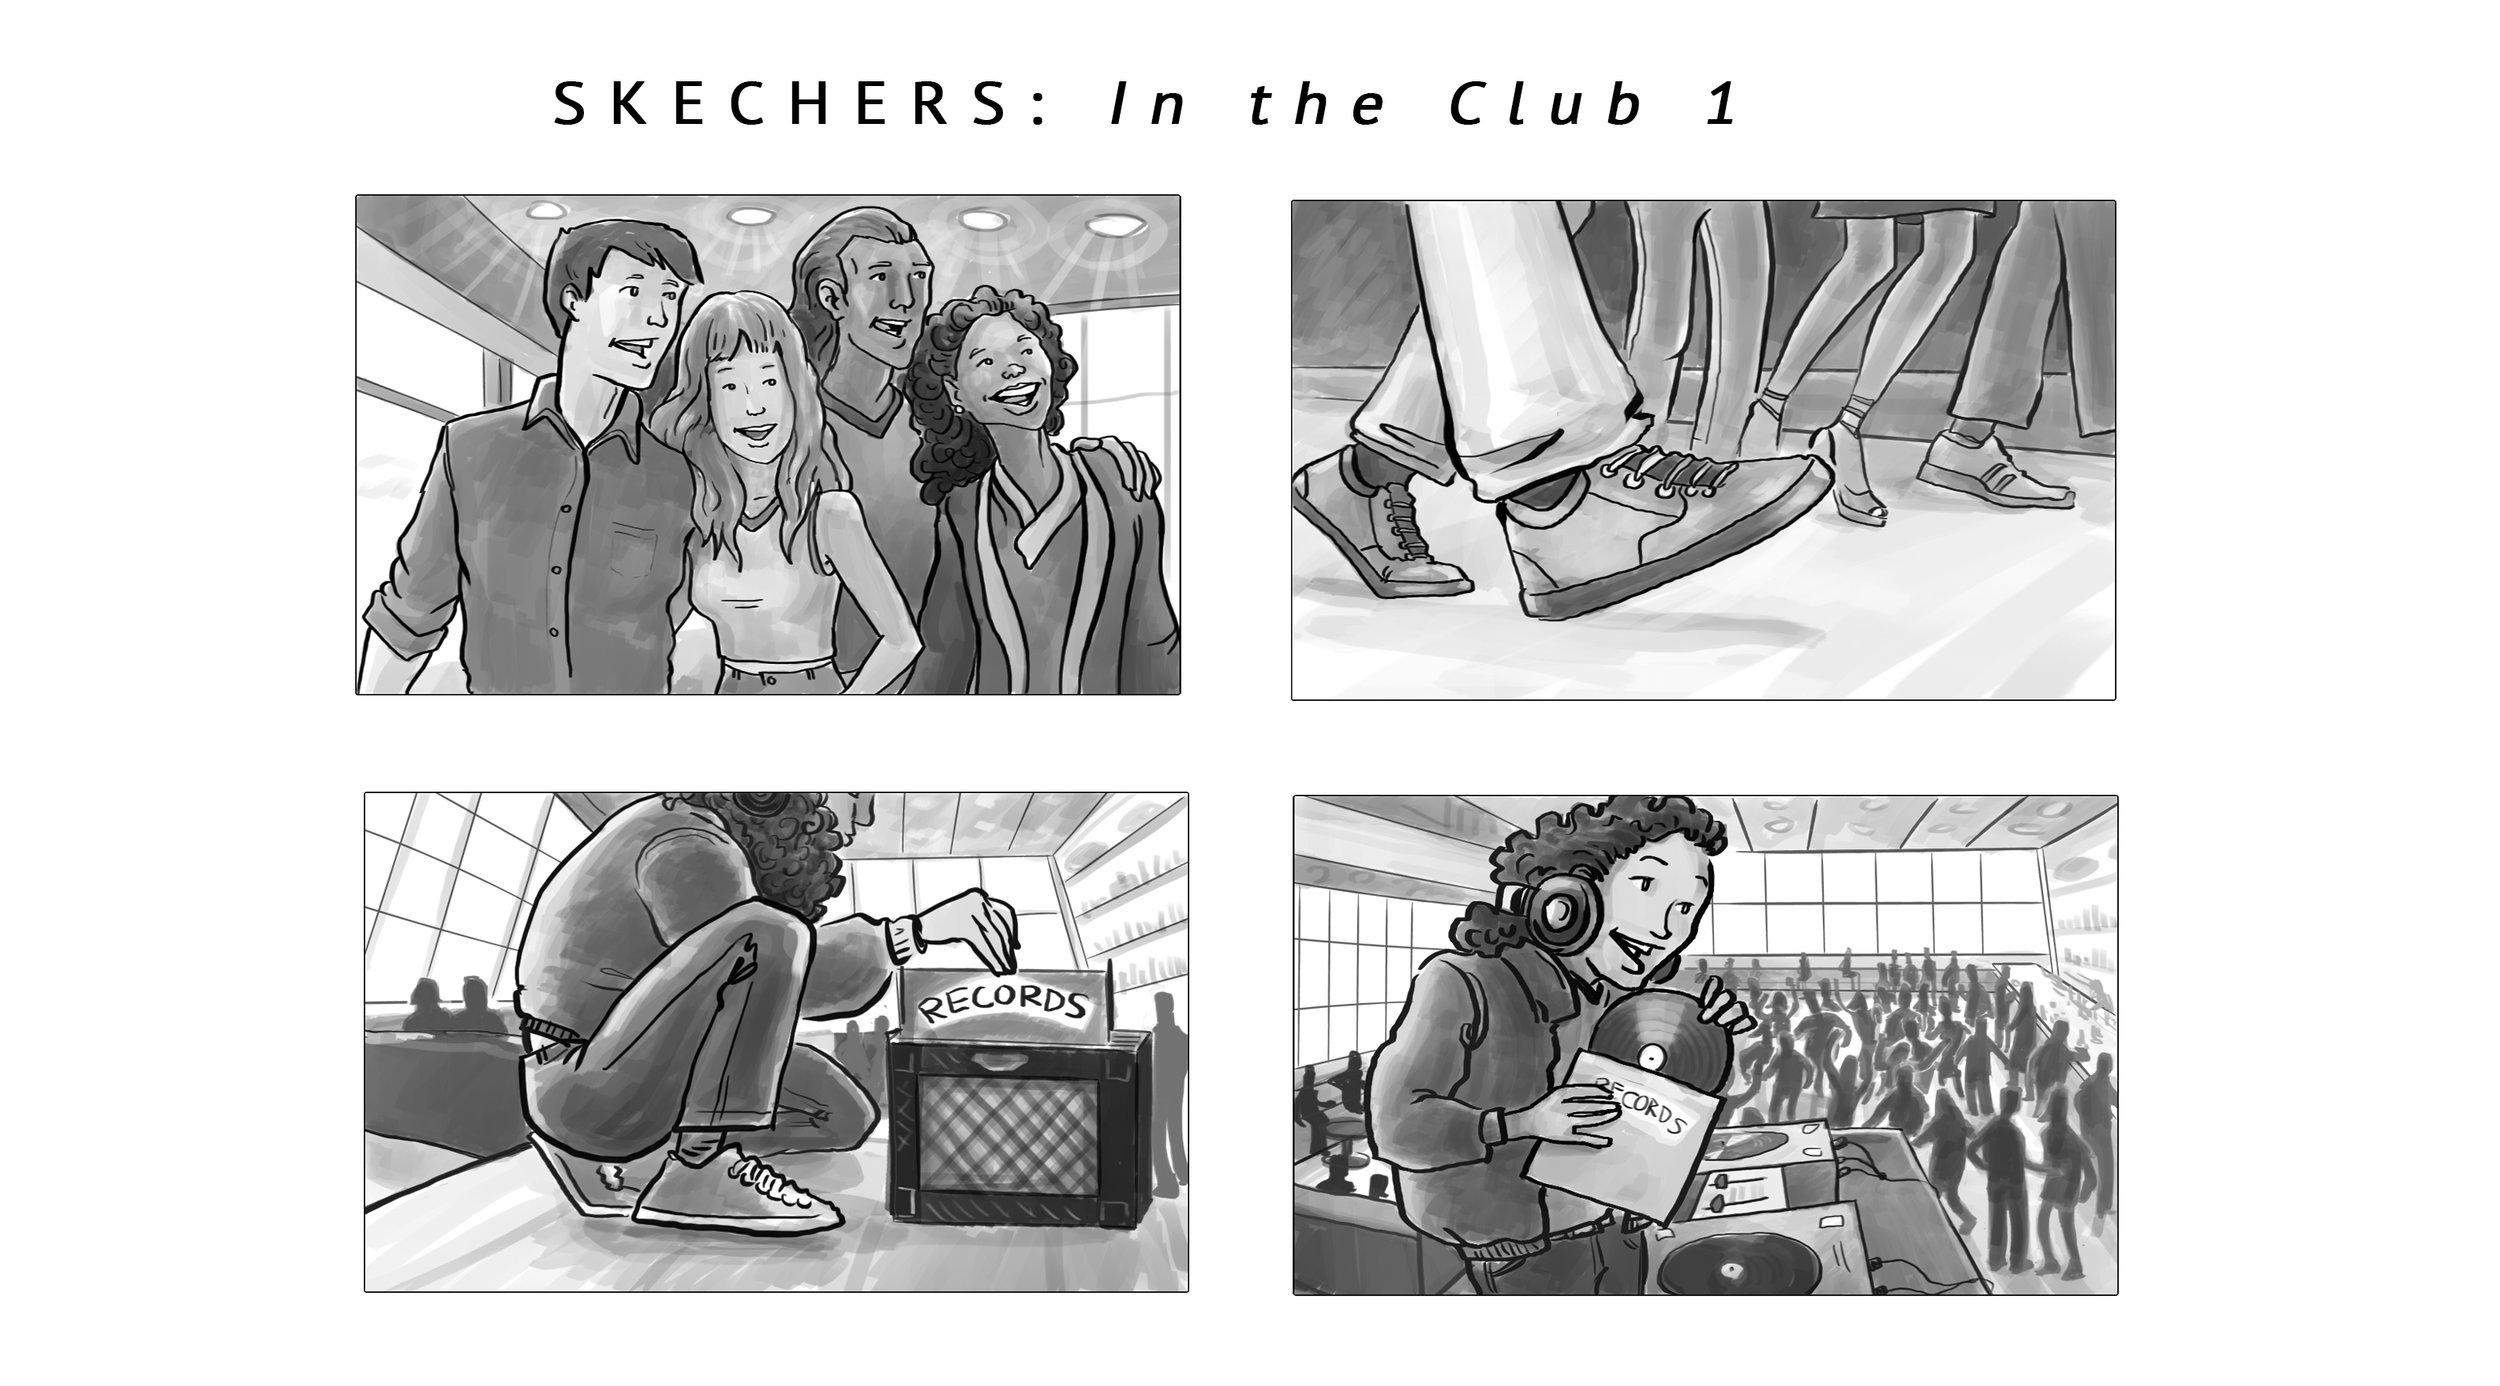 SKECHERS: VIP in the Club